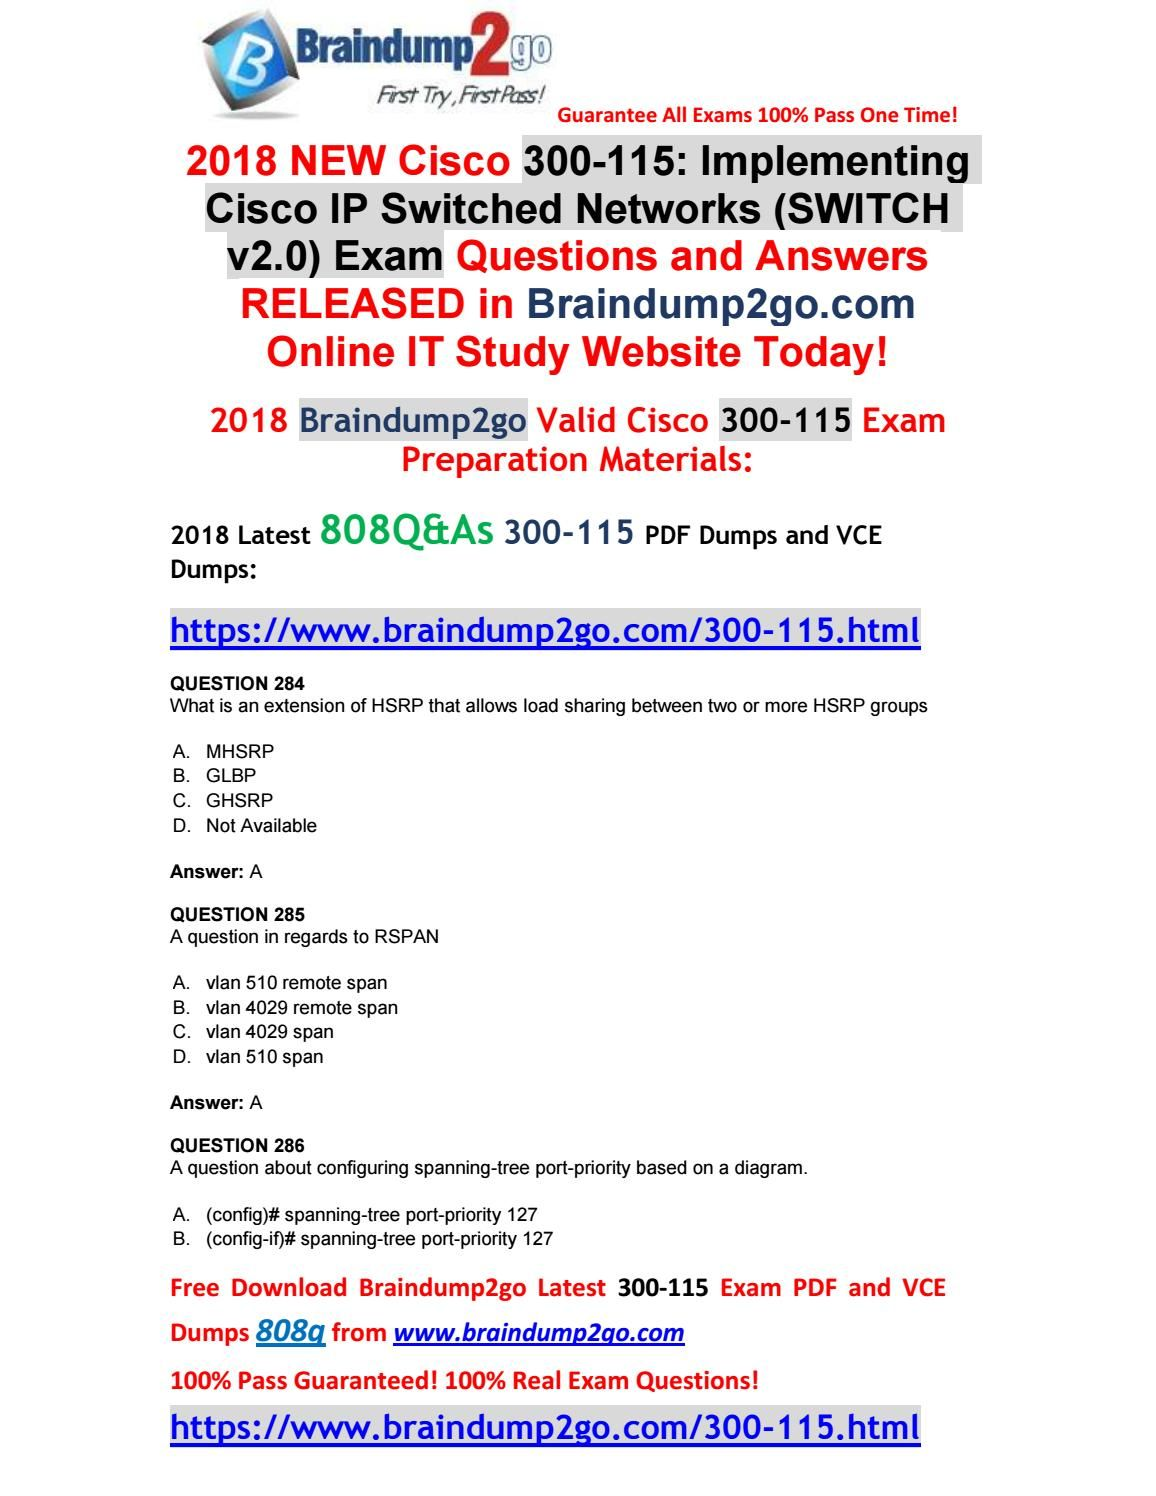 2018 8 new]braindump2go 300 115 dumps with pdf and vce 808q free